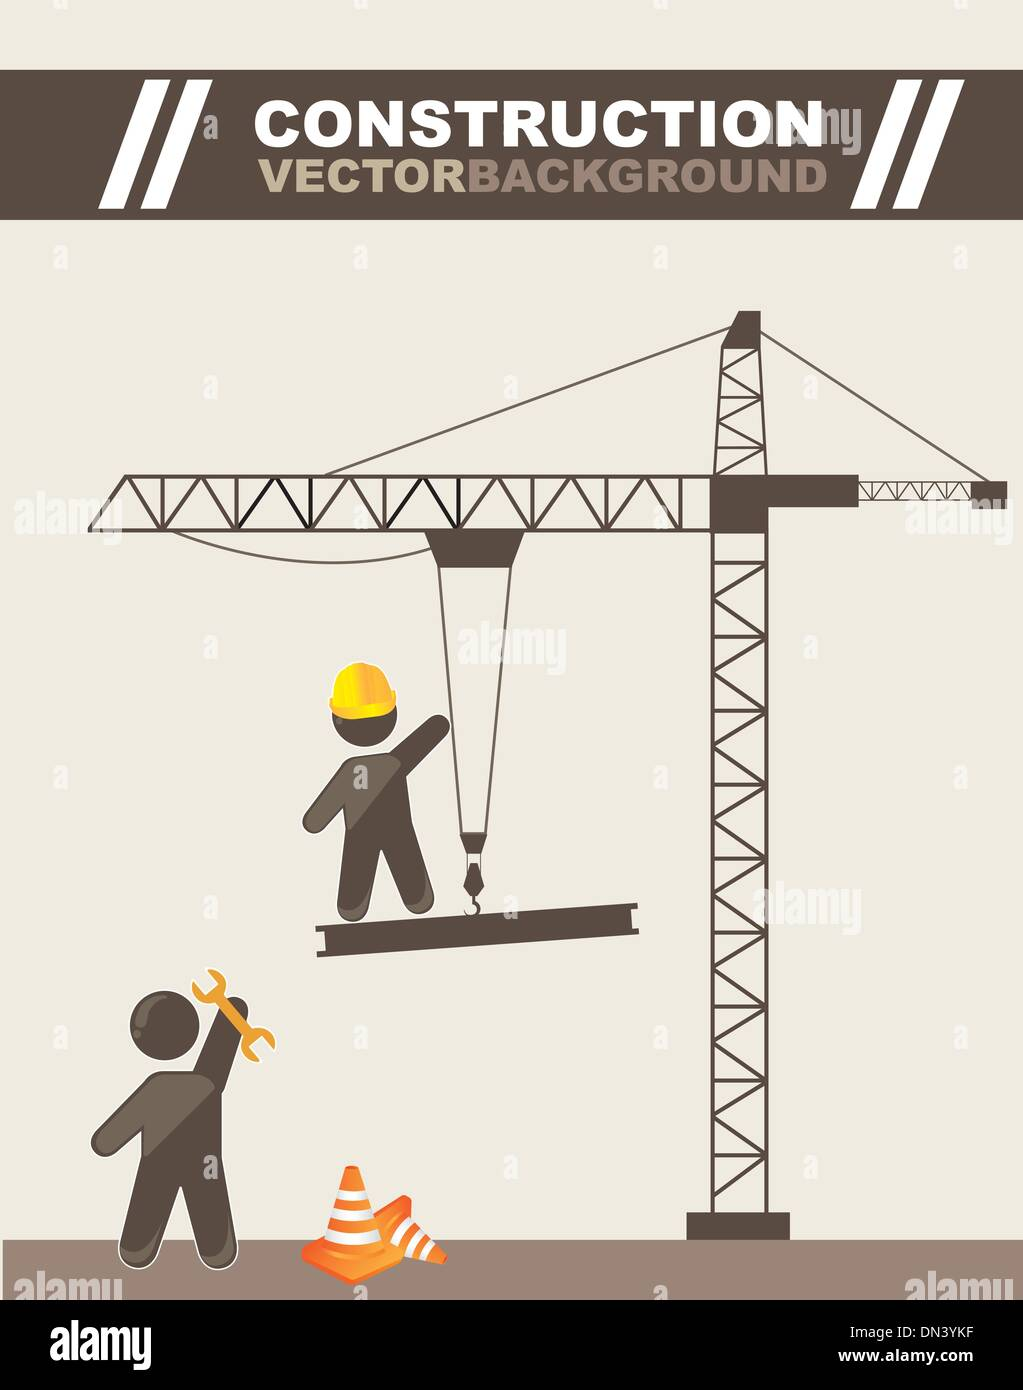 construction cartoon - Stock Image